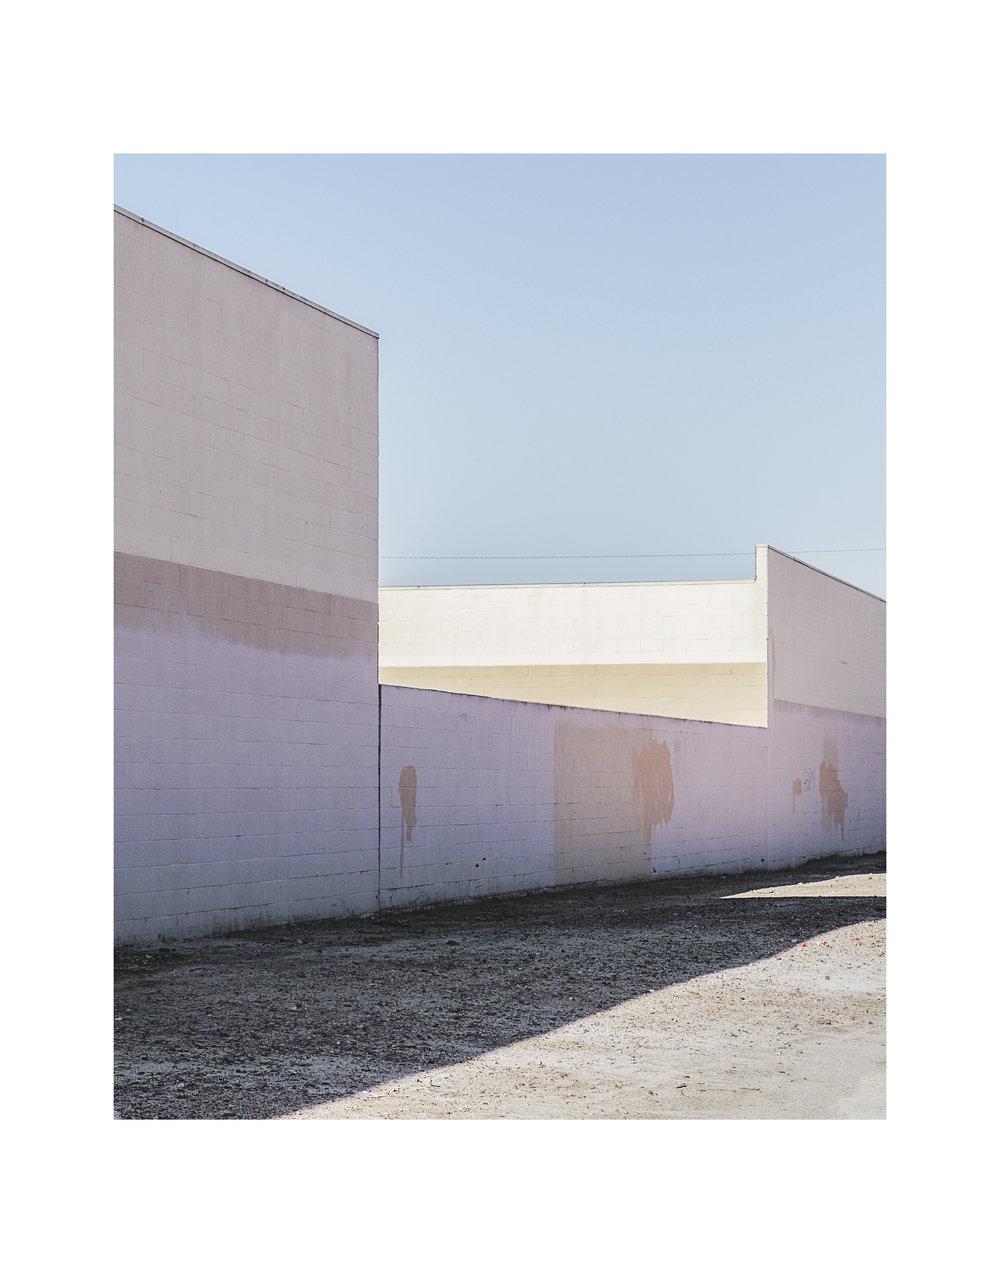 White Space #1; Buena Park, CA 2017